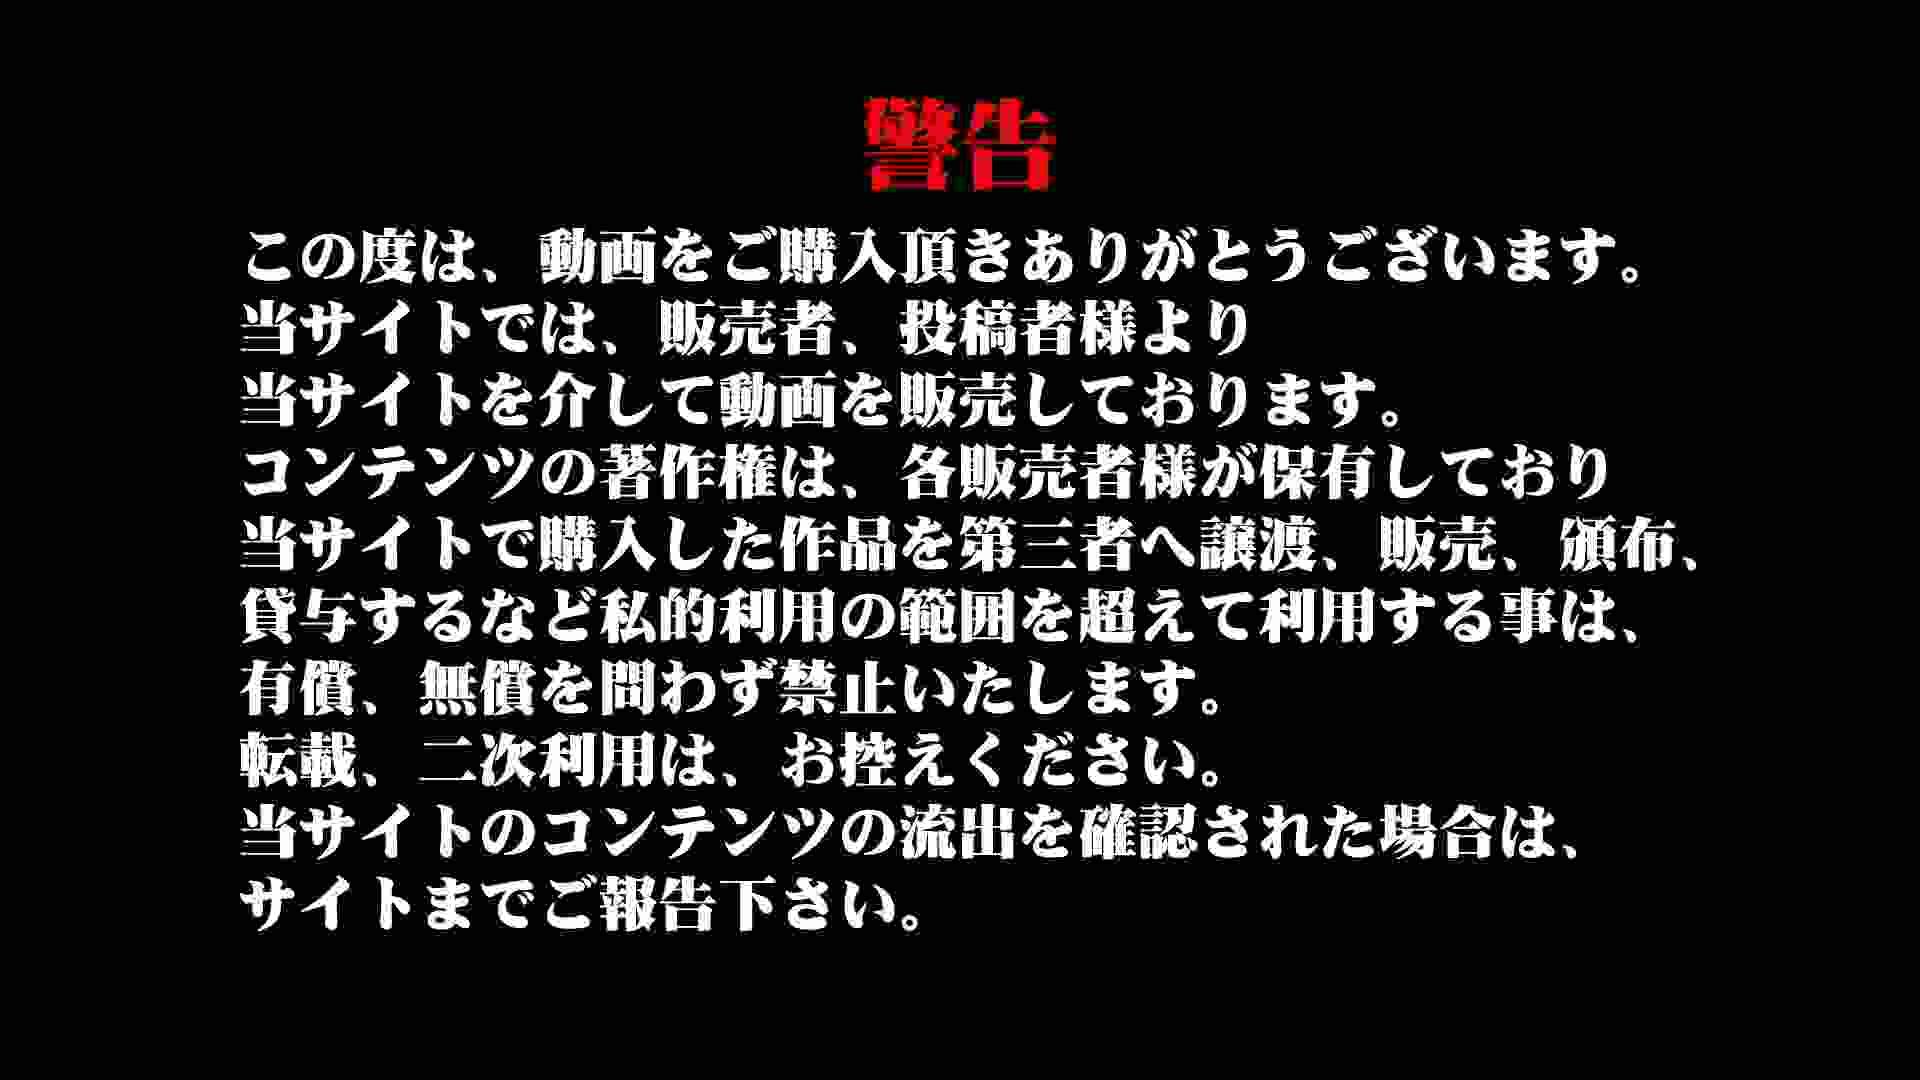 Aquaな露天風呂Vol.963 盗撮シリーズ | 露天風呂編  108PIX 3